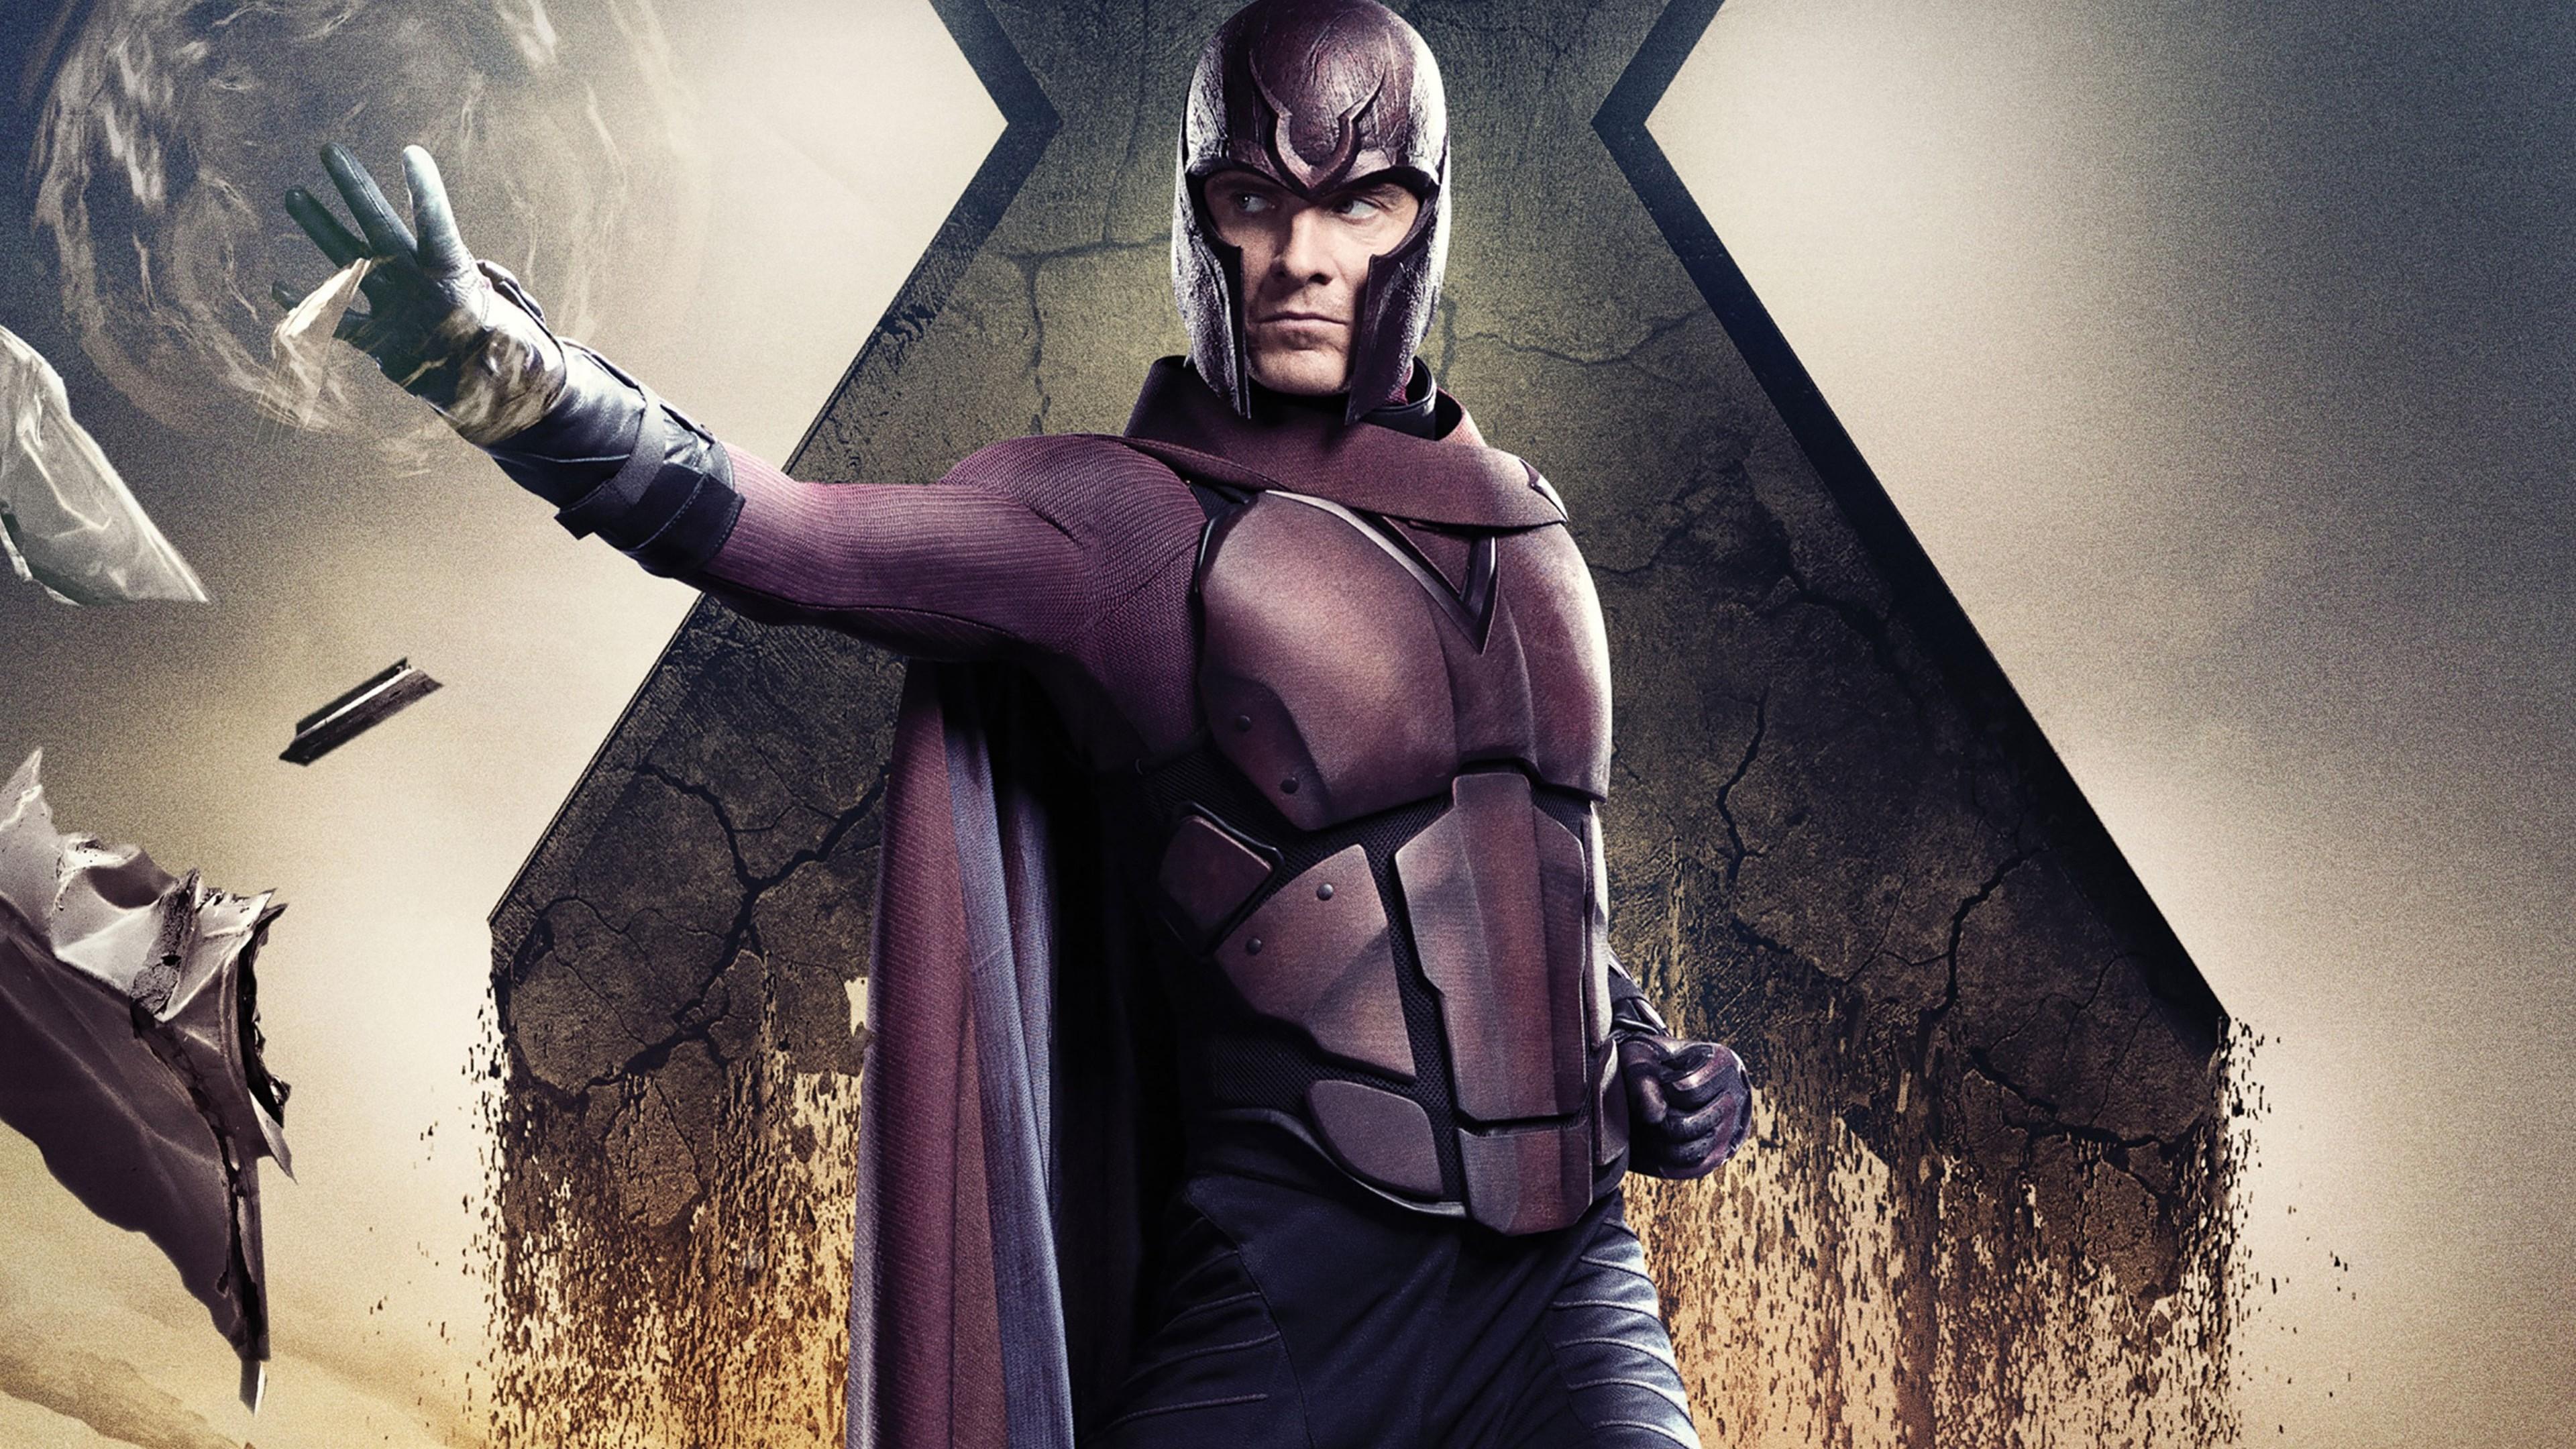 Michael Fassbender X Men Days Of Future, HD Movies, 4k ...